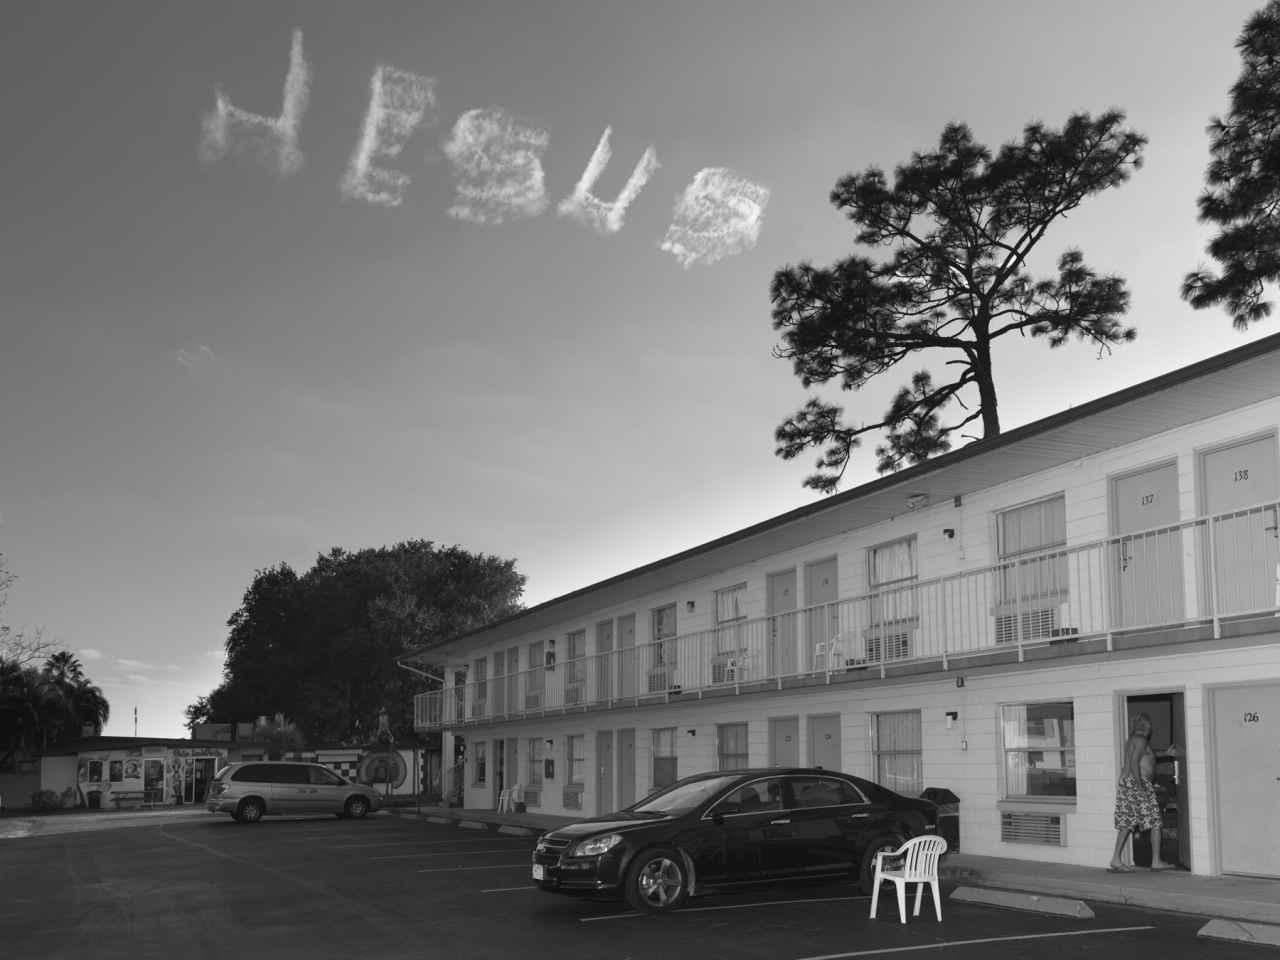 Alec Soth,  The Key Hotel. Kissimmee, Florida, 2012. Pigment print